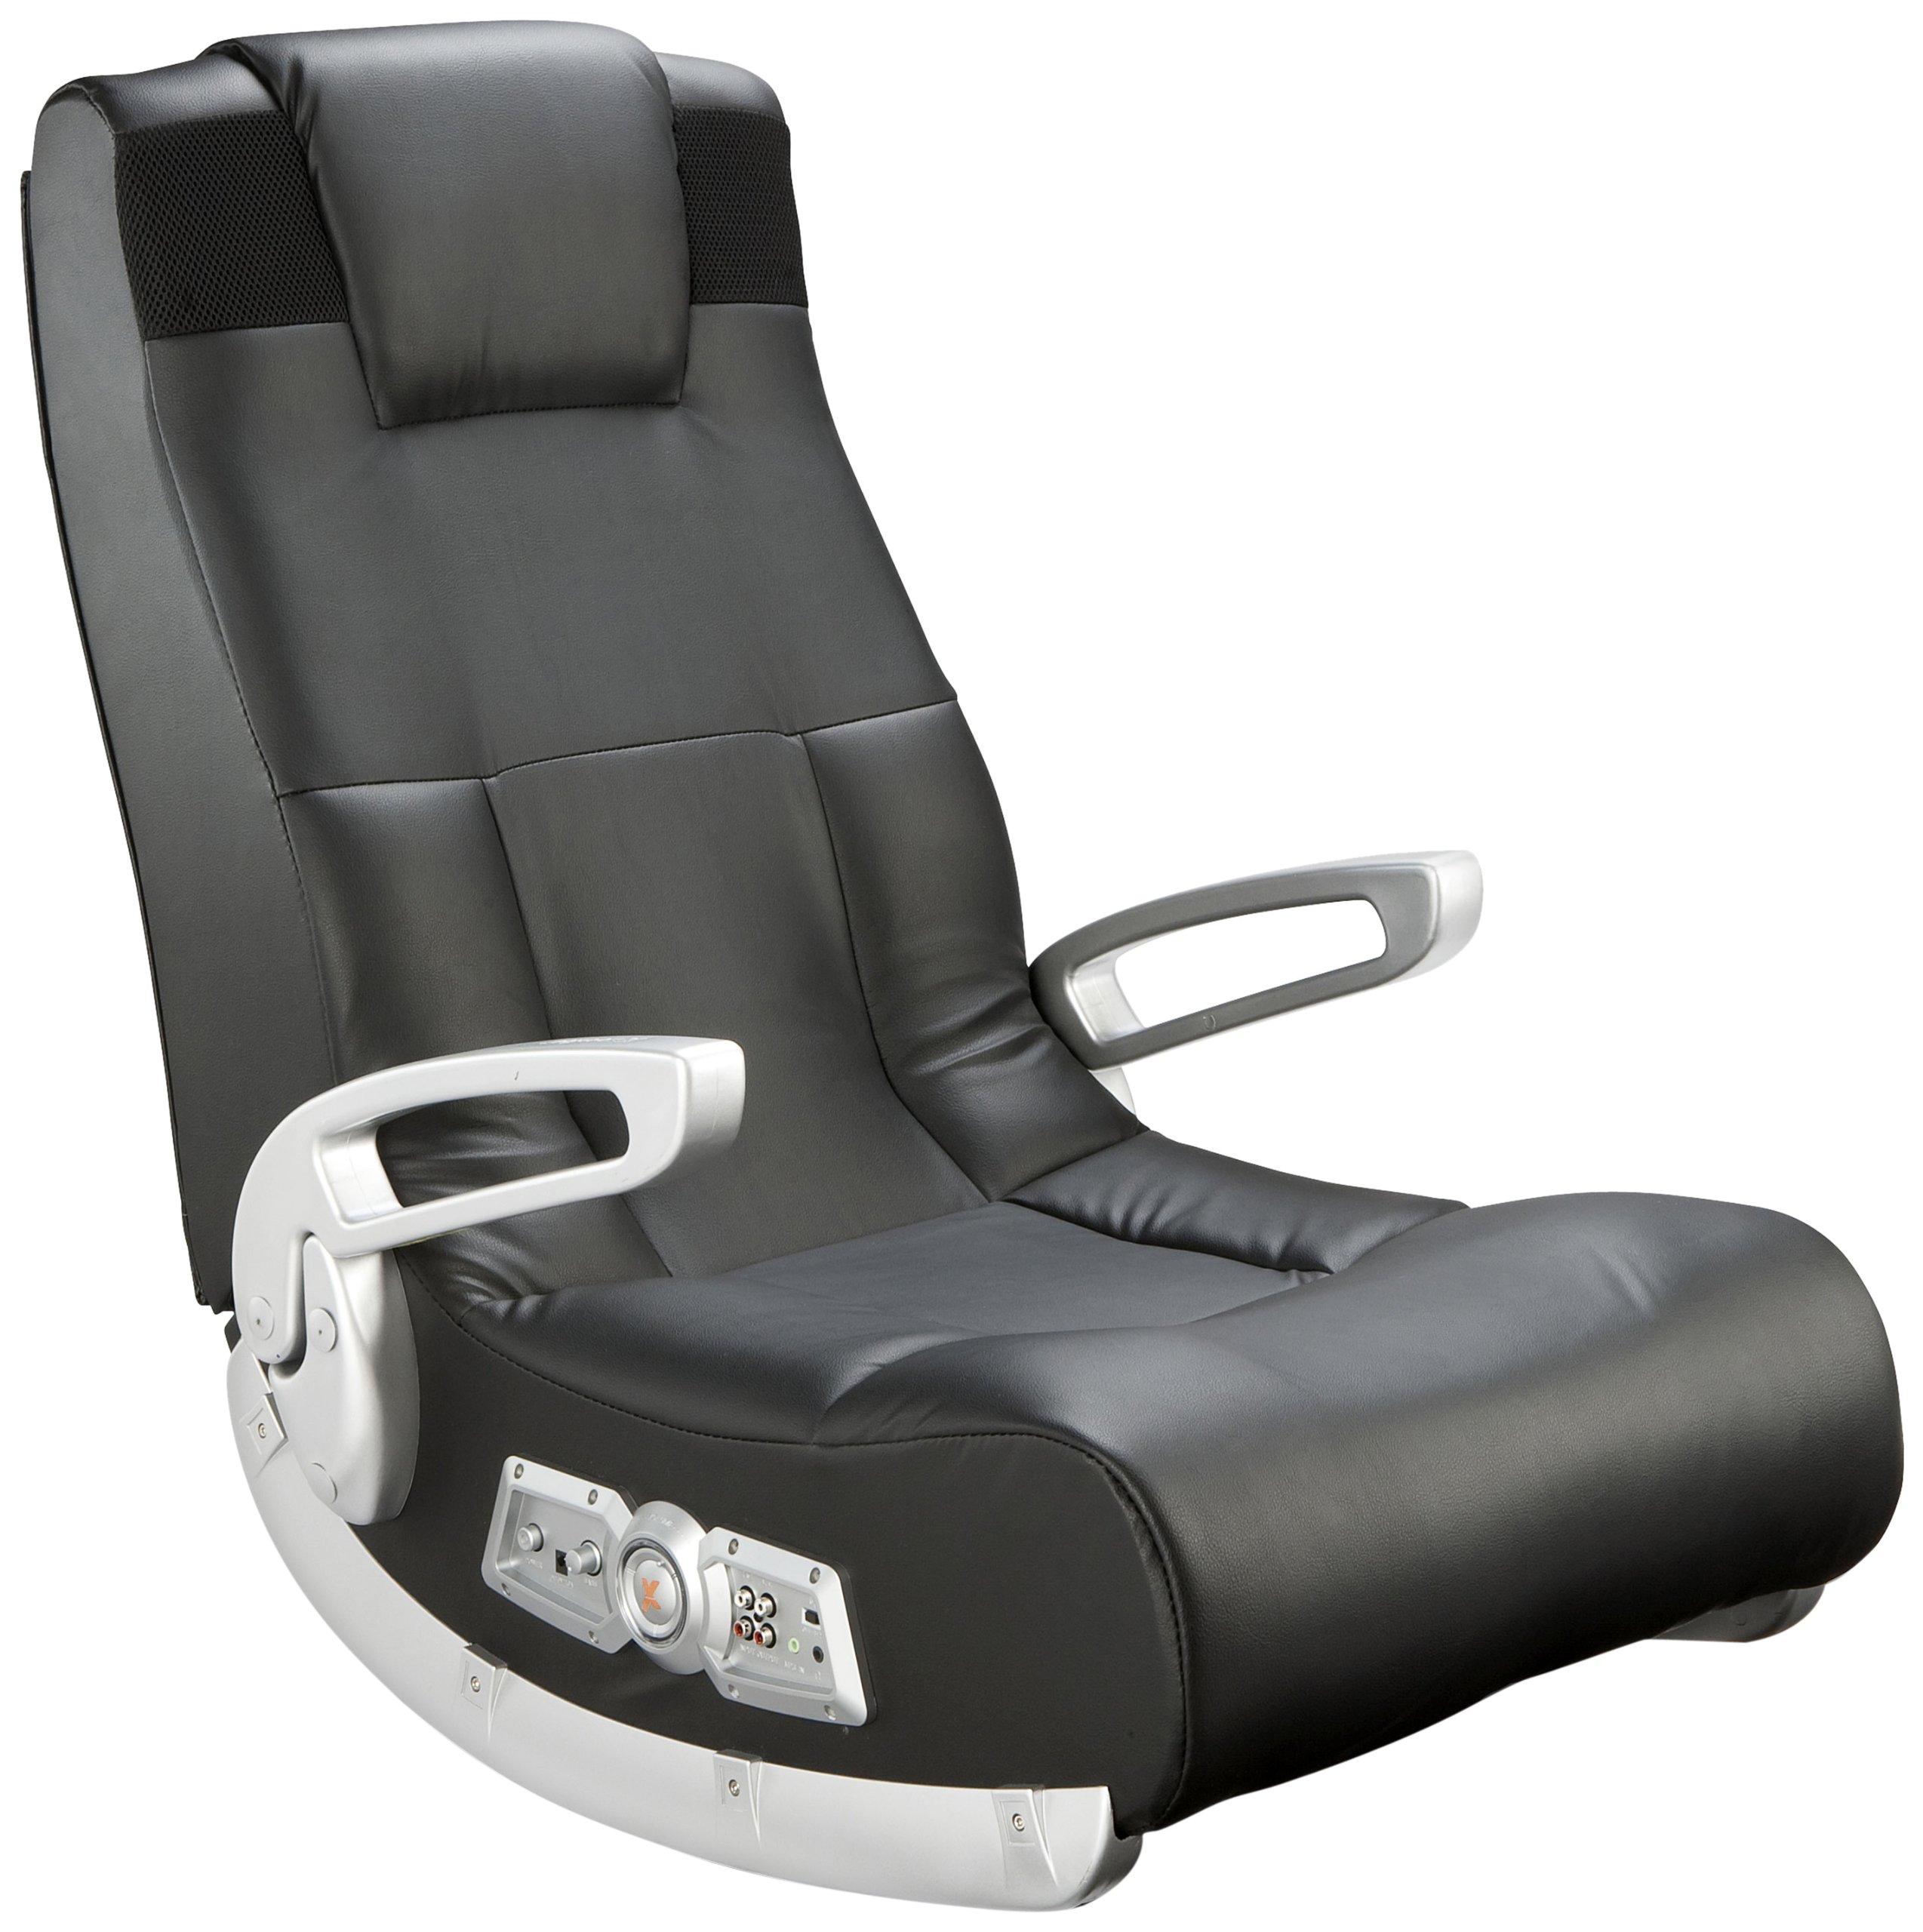 Ace Bayou X Rocker 5143601 II Video Gaming Chair, Wireless, Black by Ace Bayou